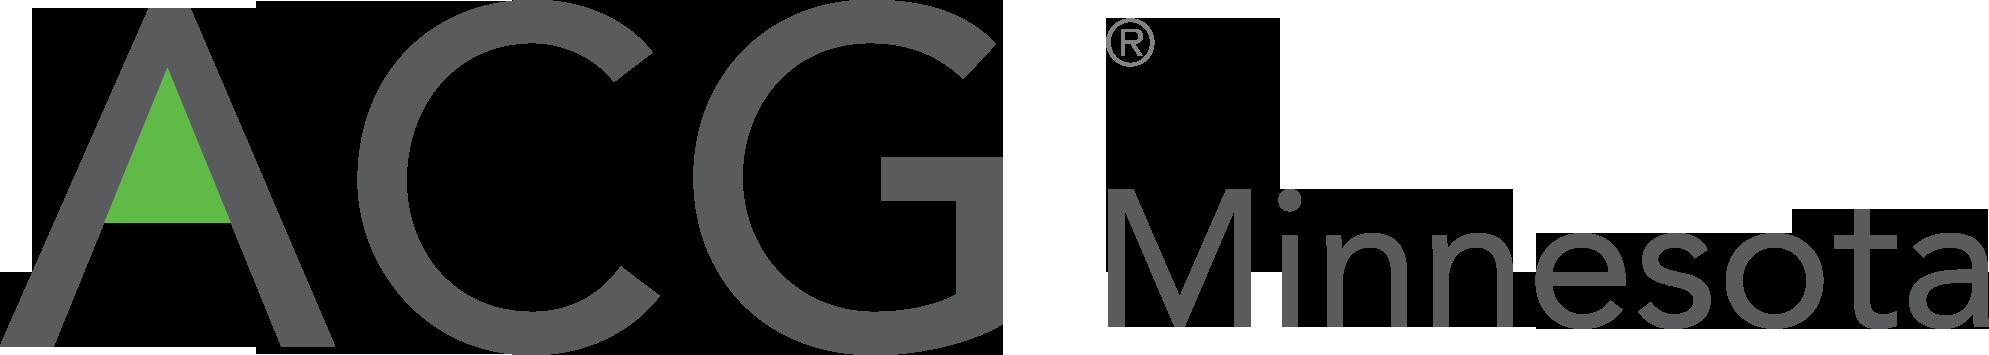 ACG Minnesota